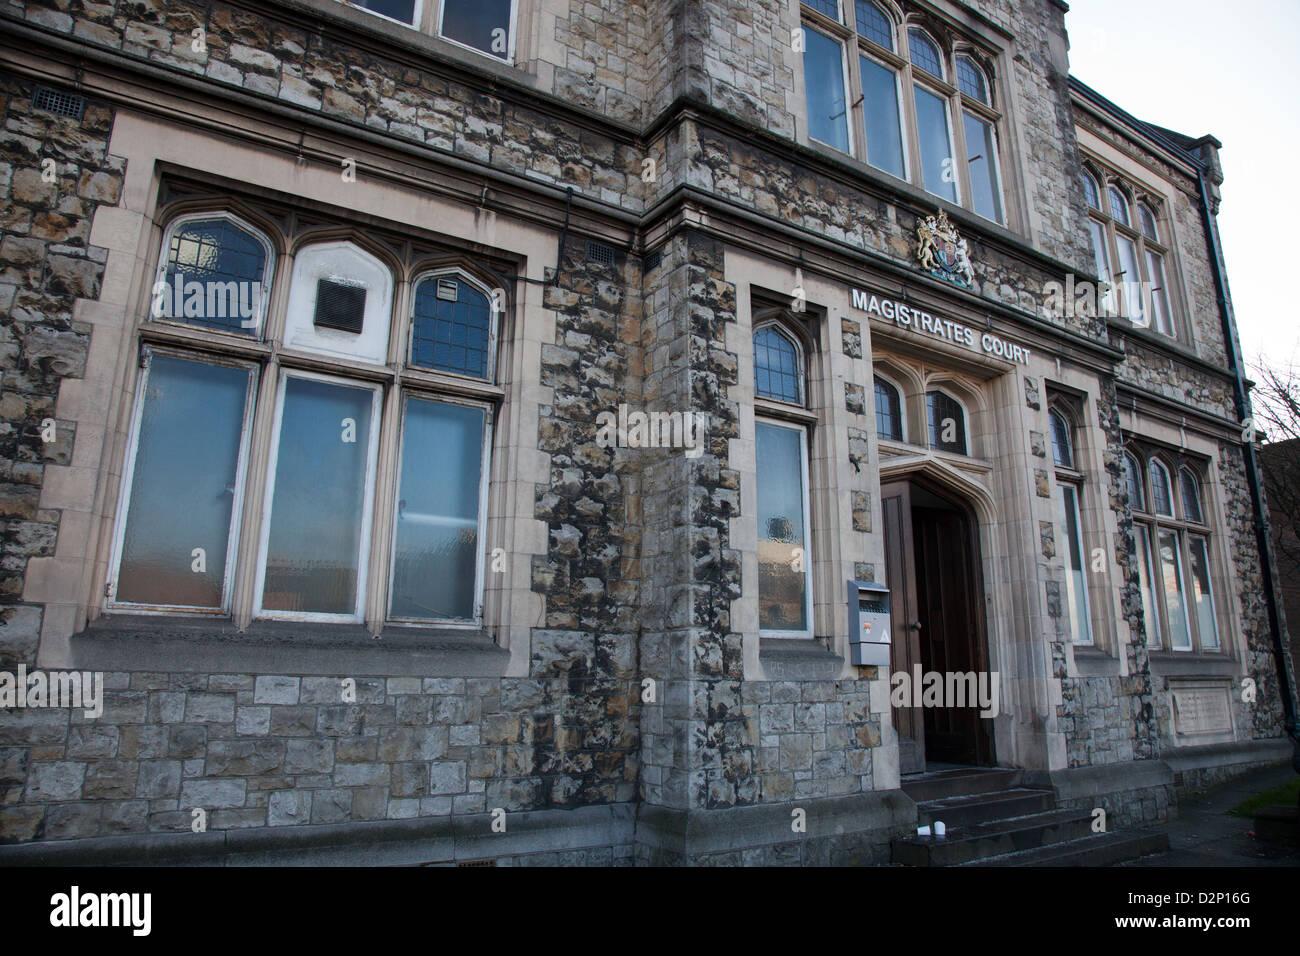 Maidstone Magistrates Court, Kent - Stock Image